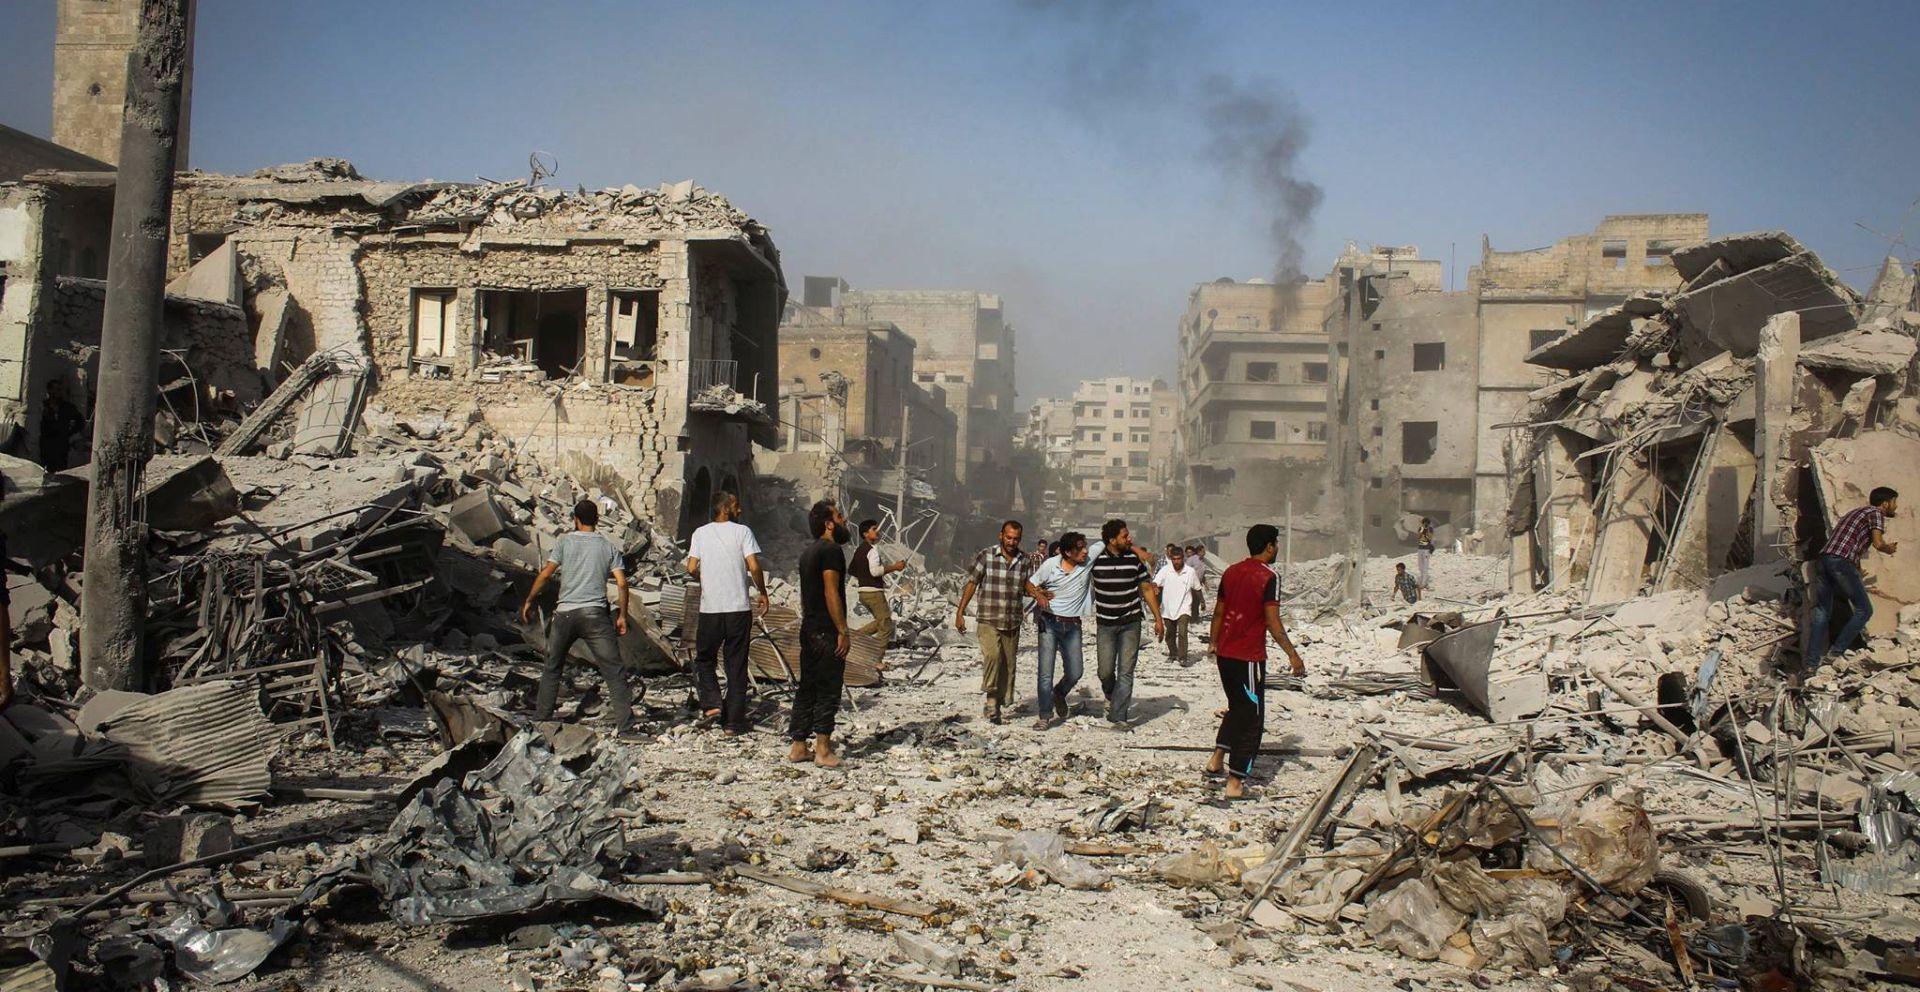 SIRIJA: Konvoj s pomoći krenuo u opkoljeni grad